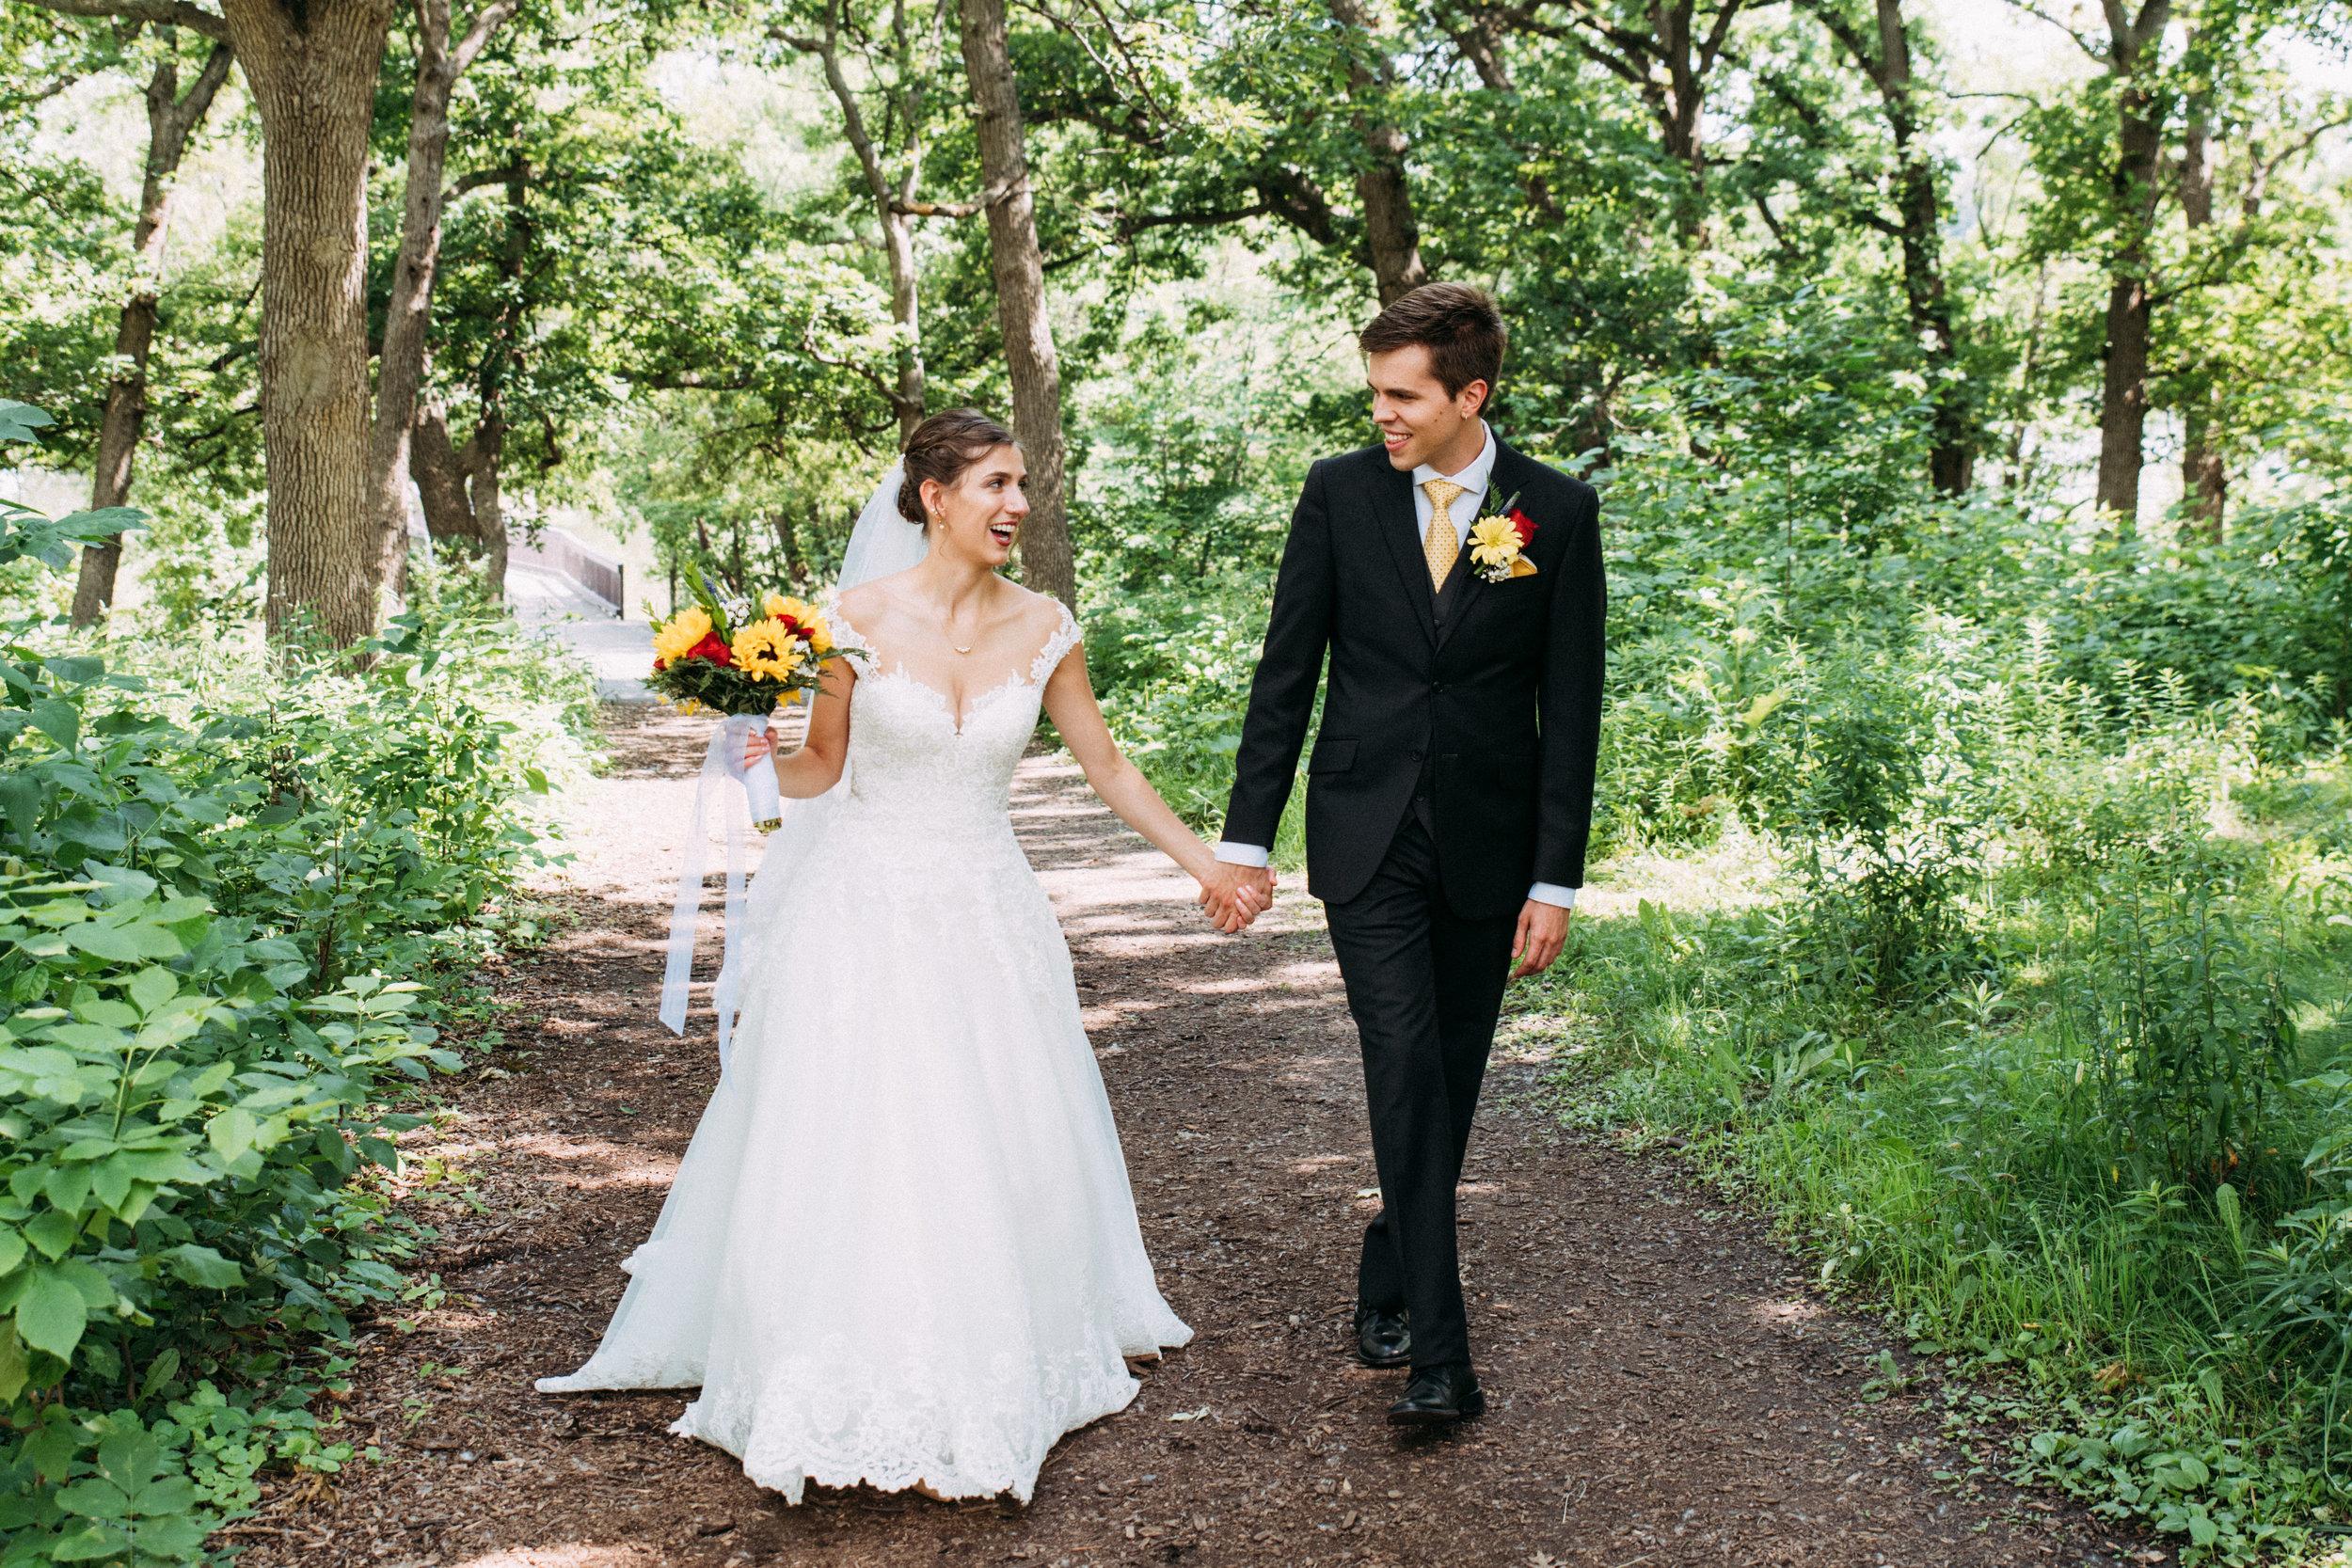 12-Liza_Chris_Minneapolis_Minnesota_Wedding.jpg